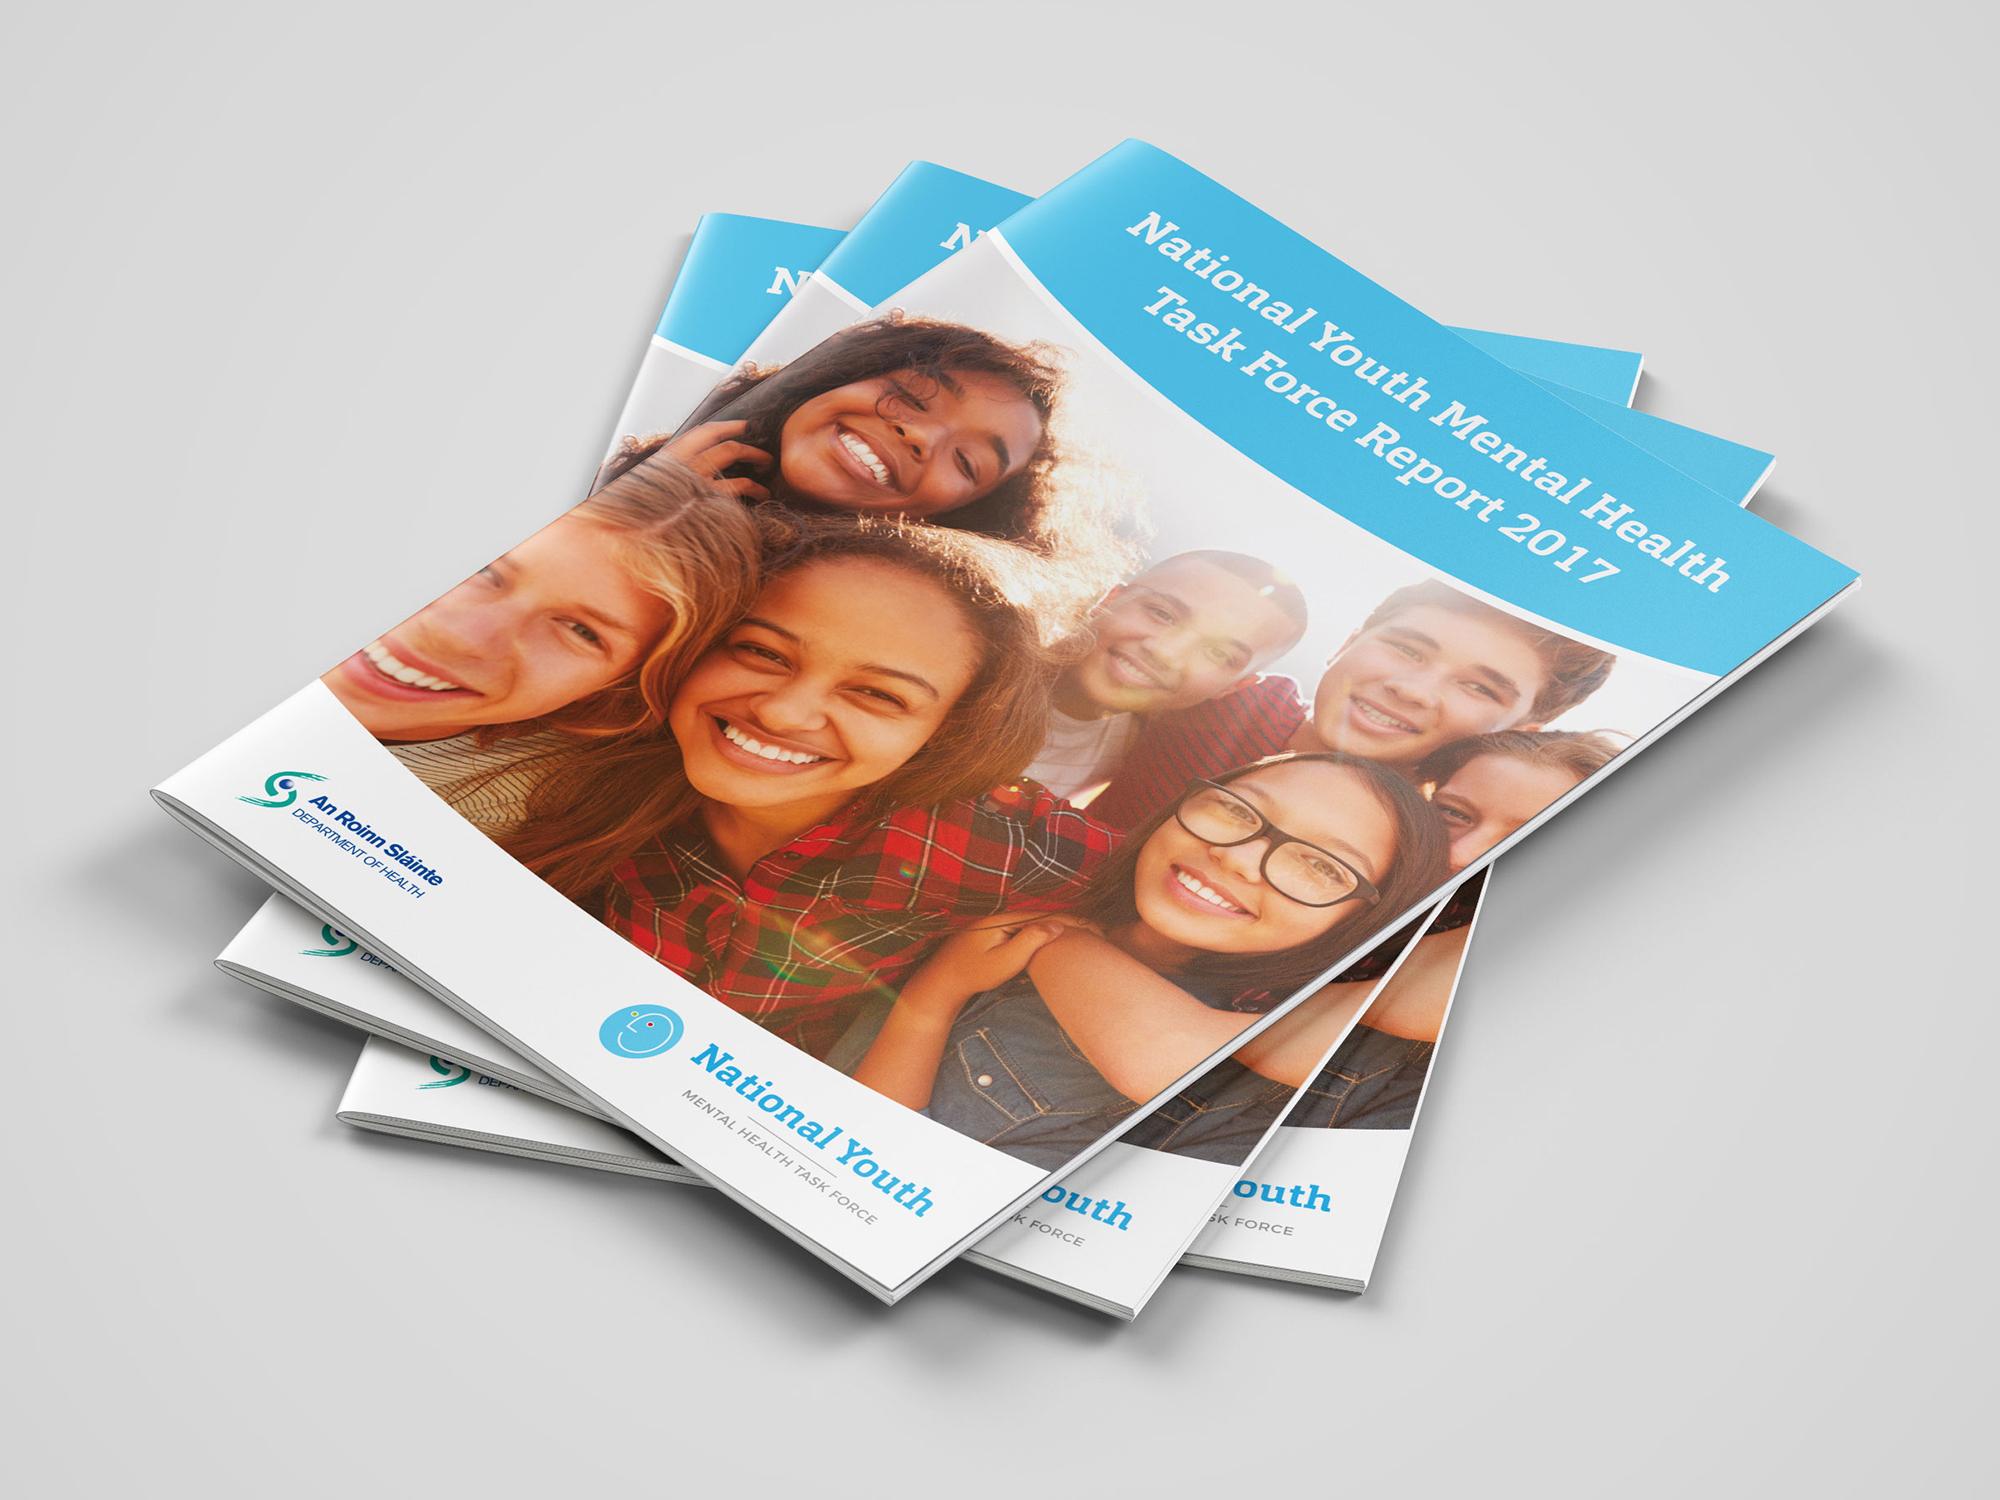 Dept_Health_A4_Brochure_Mockup_1.jpg